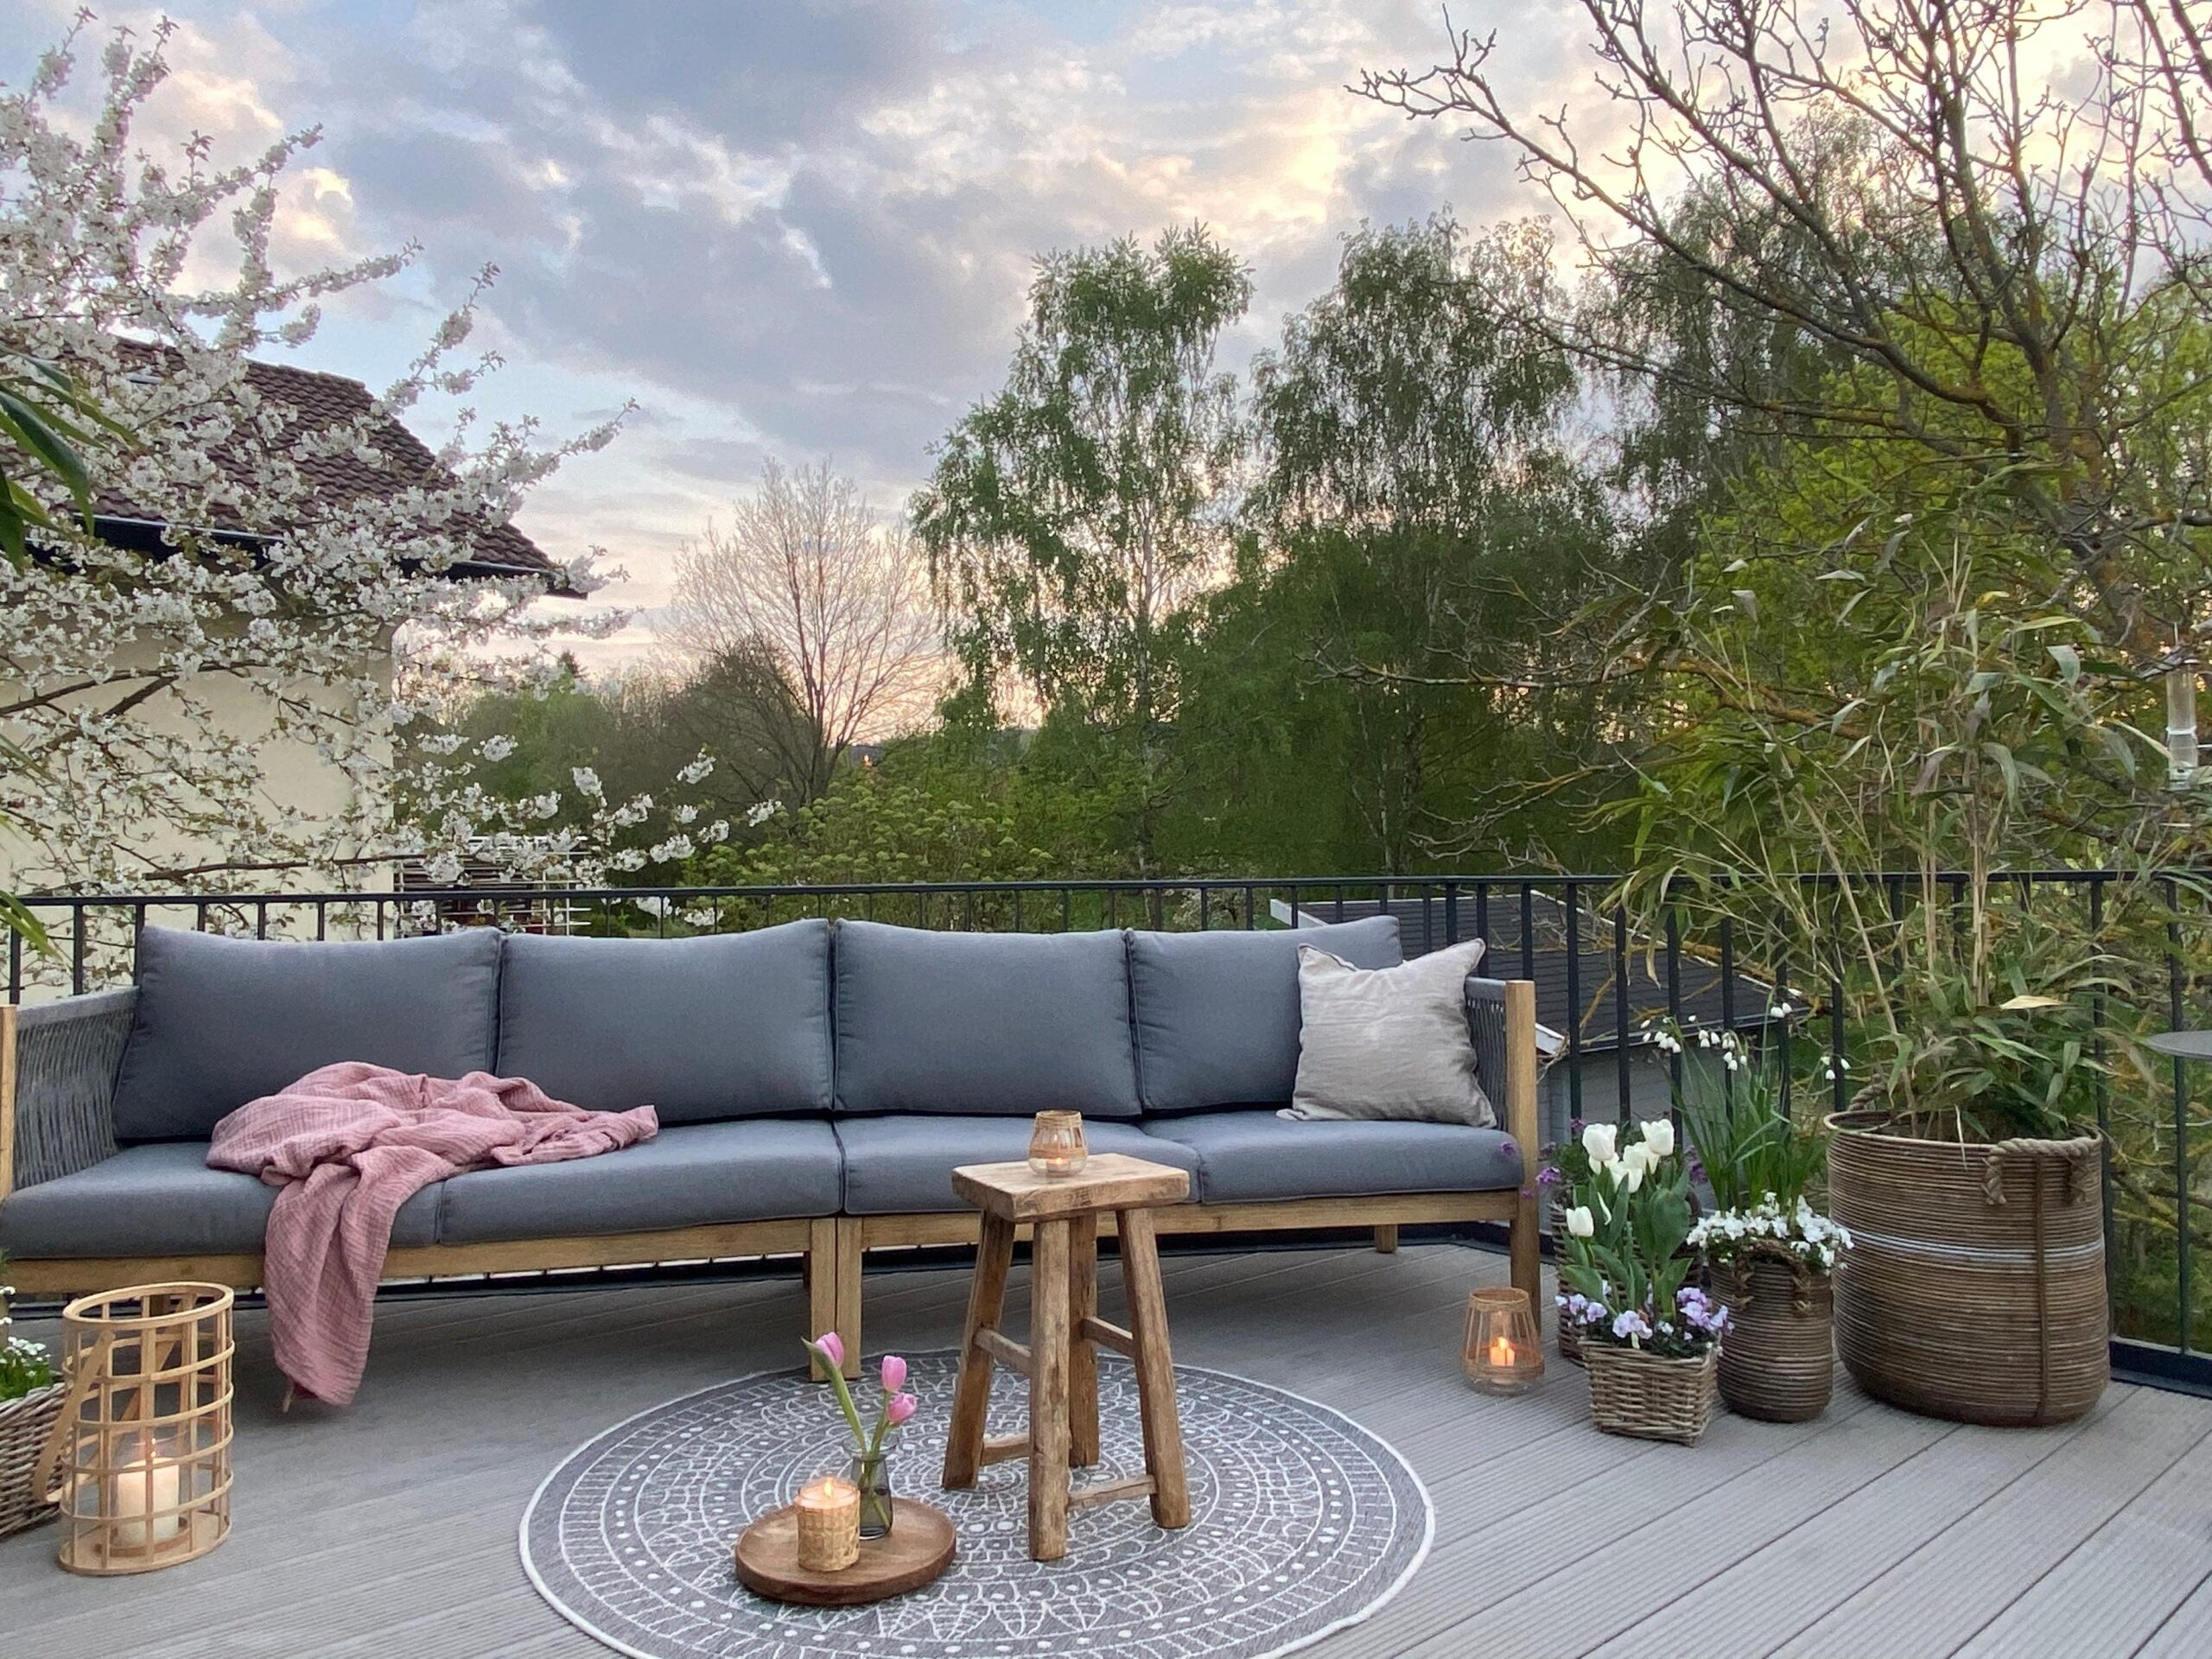 Full Size of  Wohnzimmer Couch Terrasse